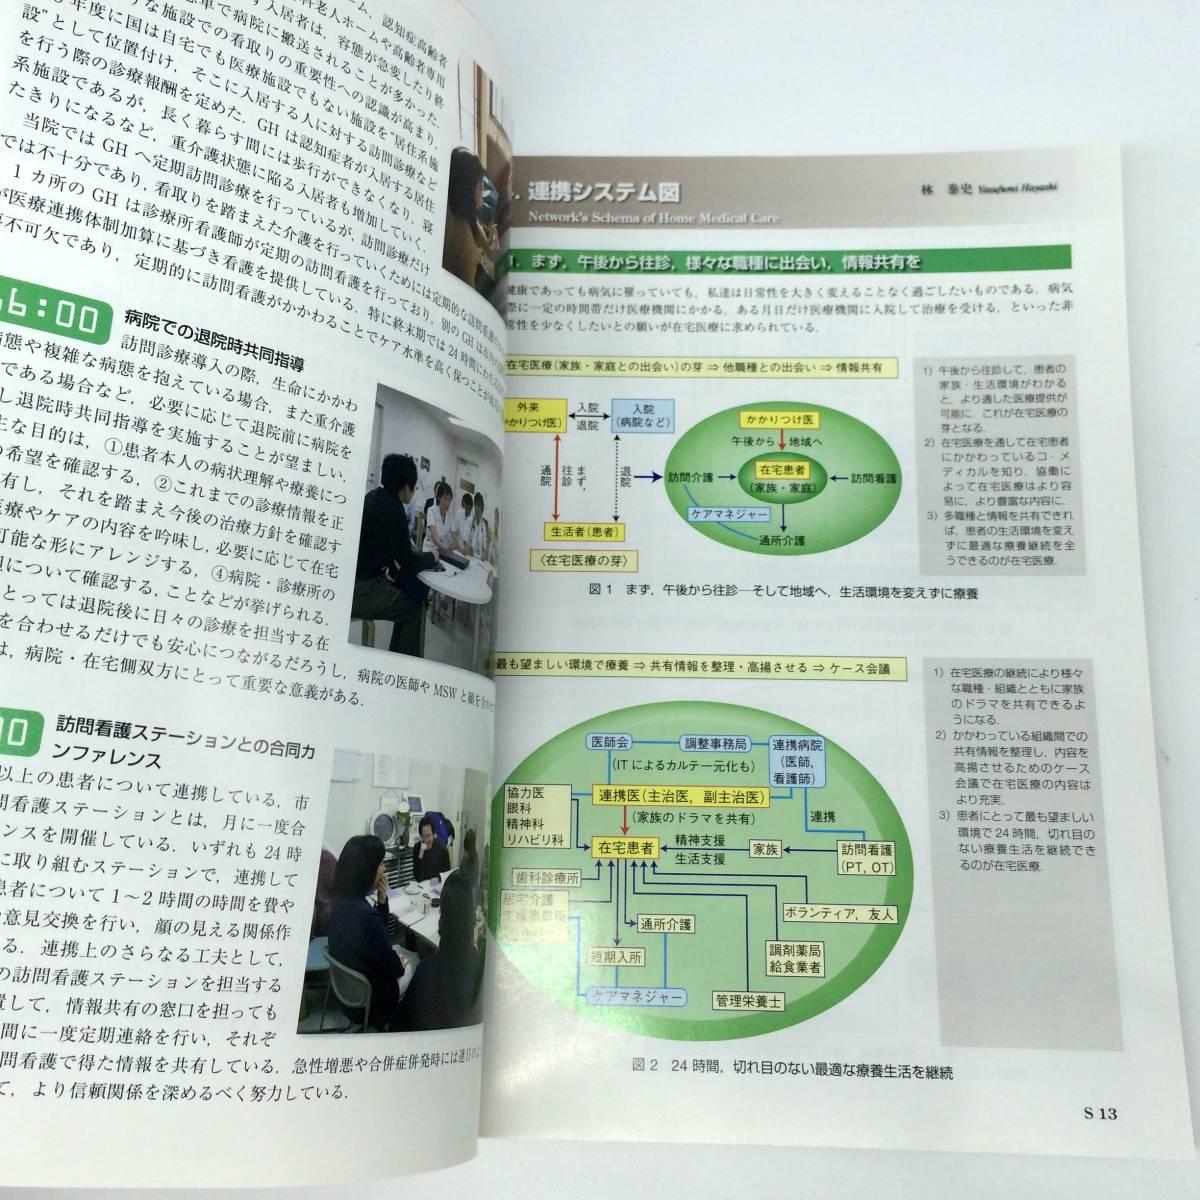 在宅医療 午後から地域へ 生涯教育シリーズ 78 日本医師会雑誌 第139巻 特別号_画像5